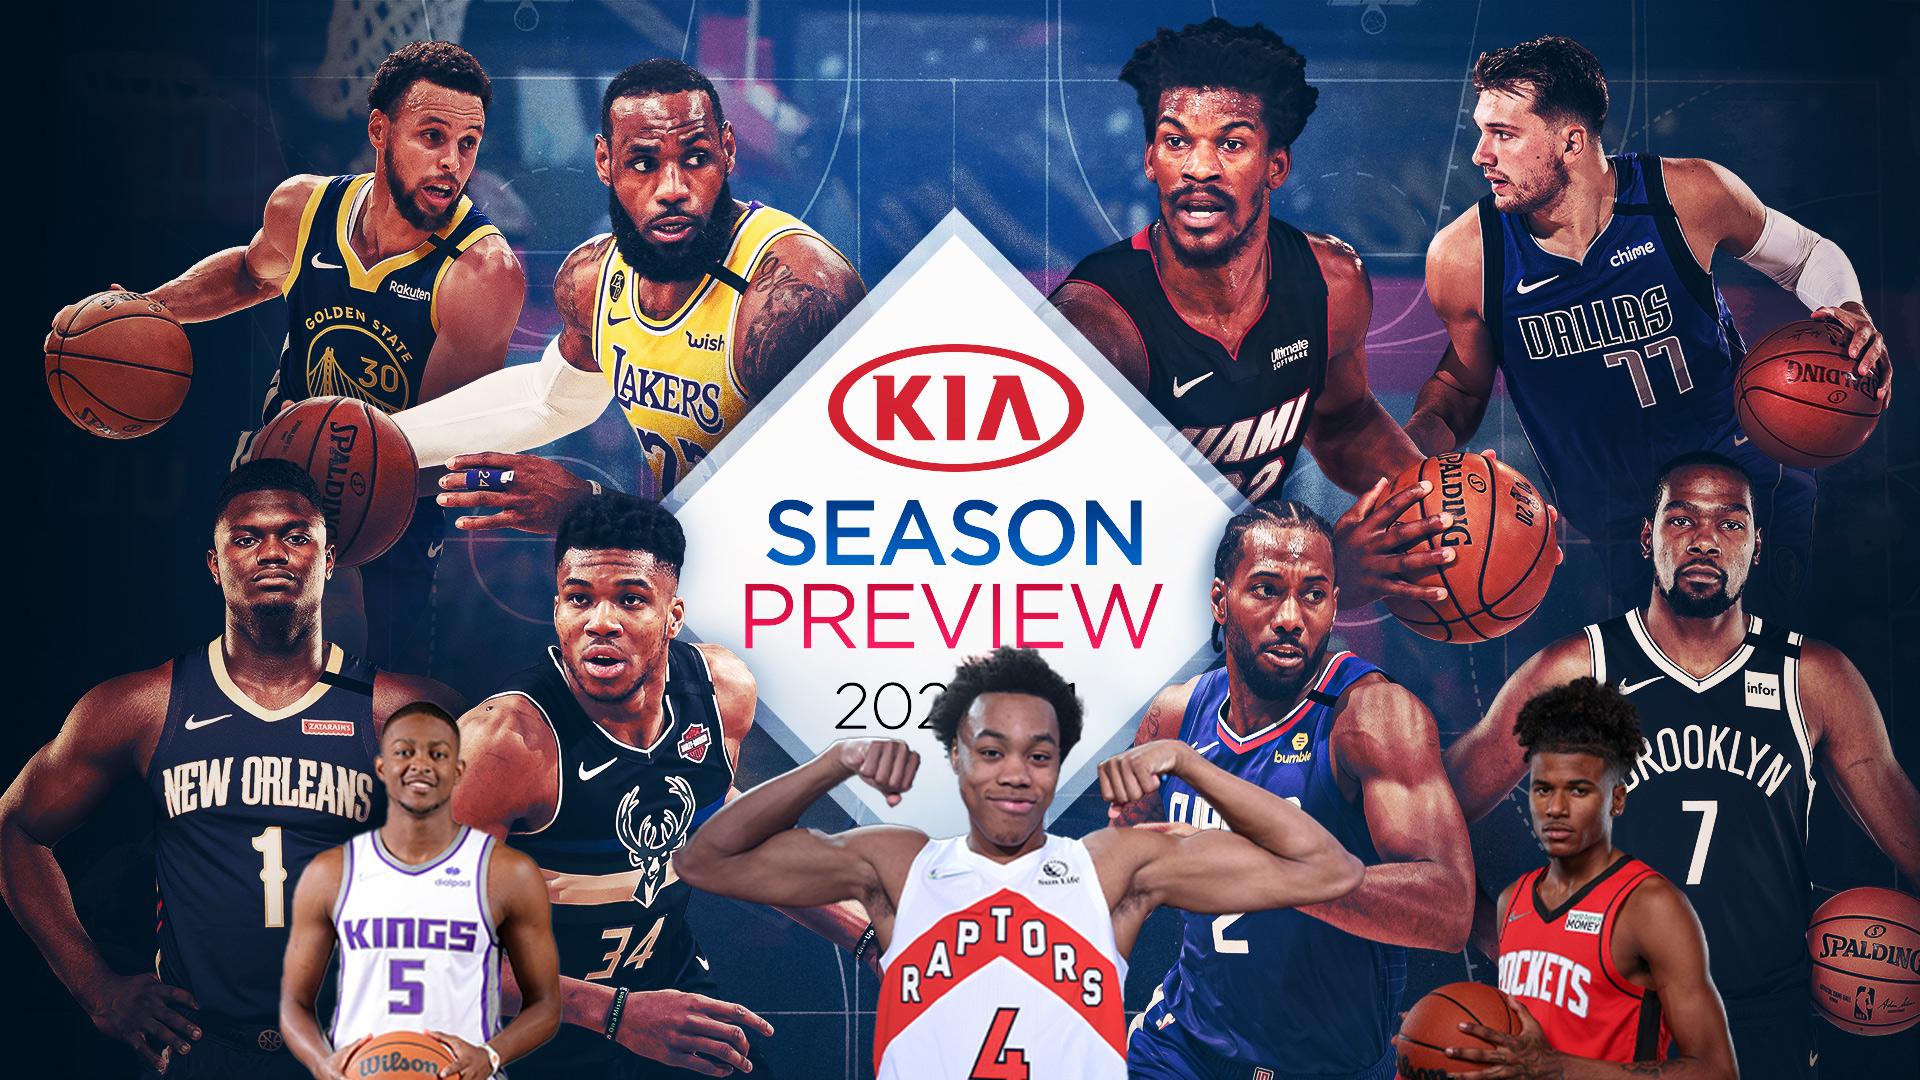 Previewing the Sacramento Kings - Playoffs this season?